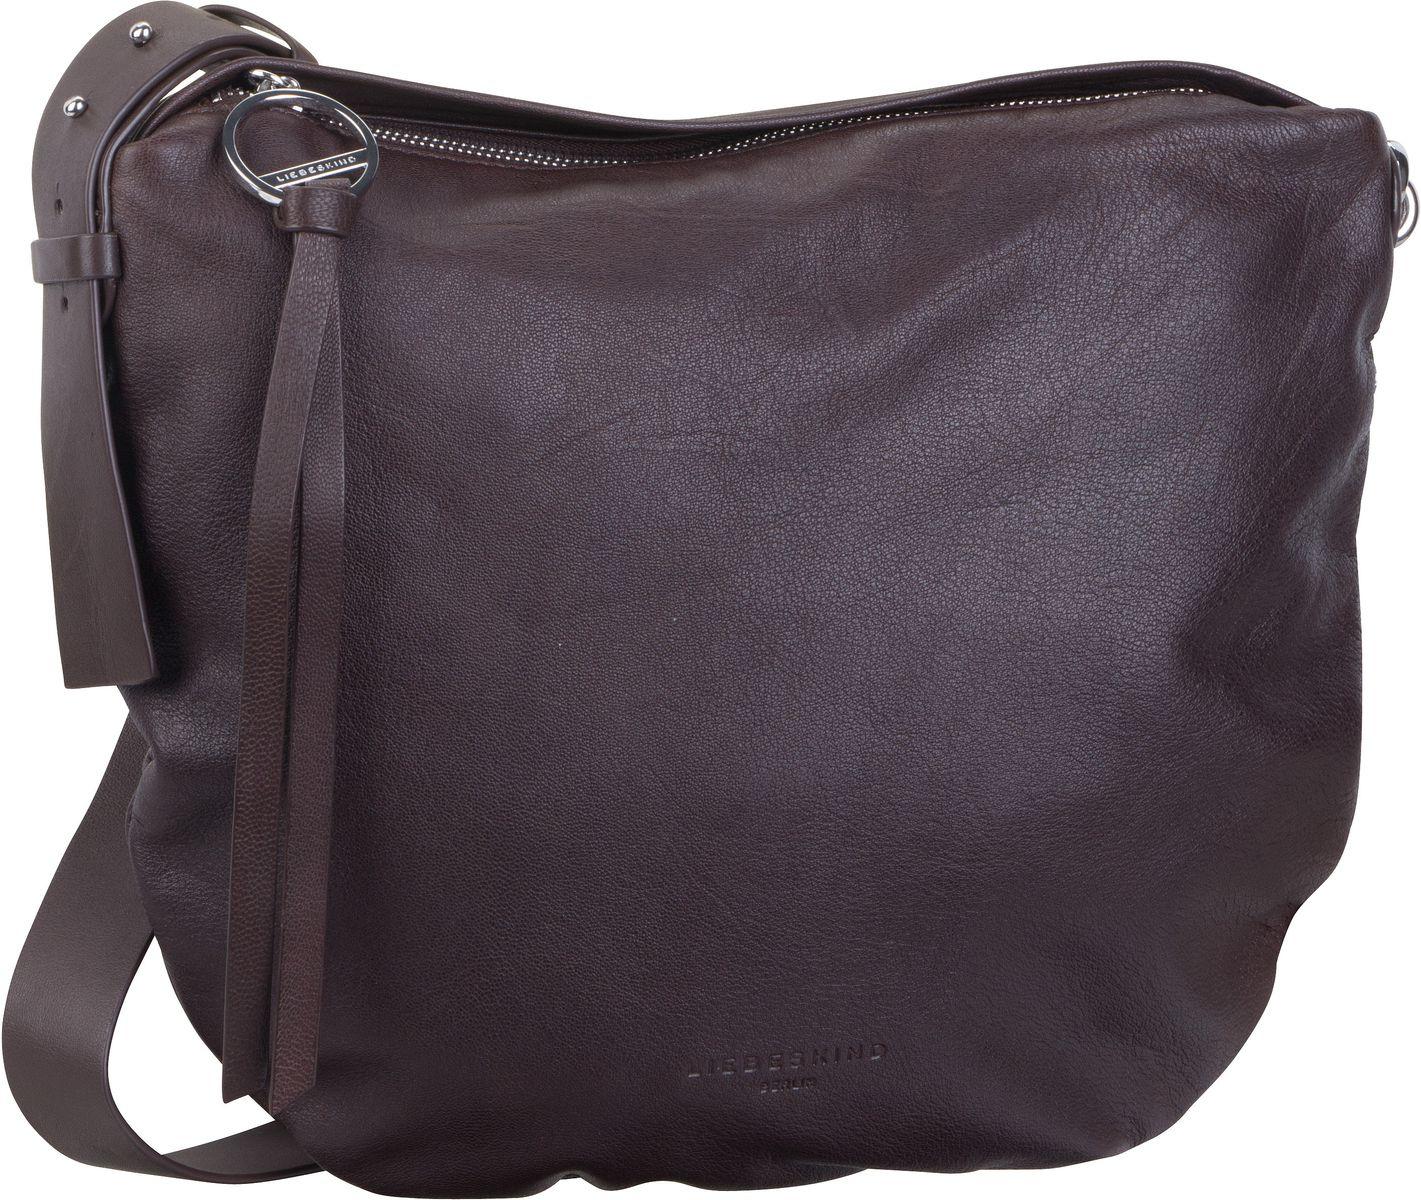 Berlin Umhängetasche Dive Bag 2 Crossbody M Dark Brown